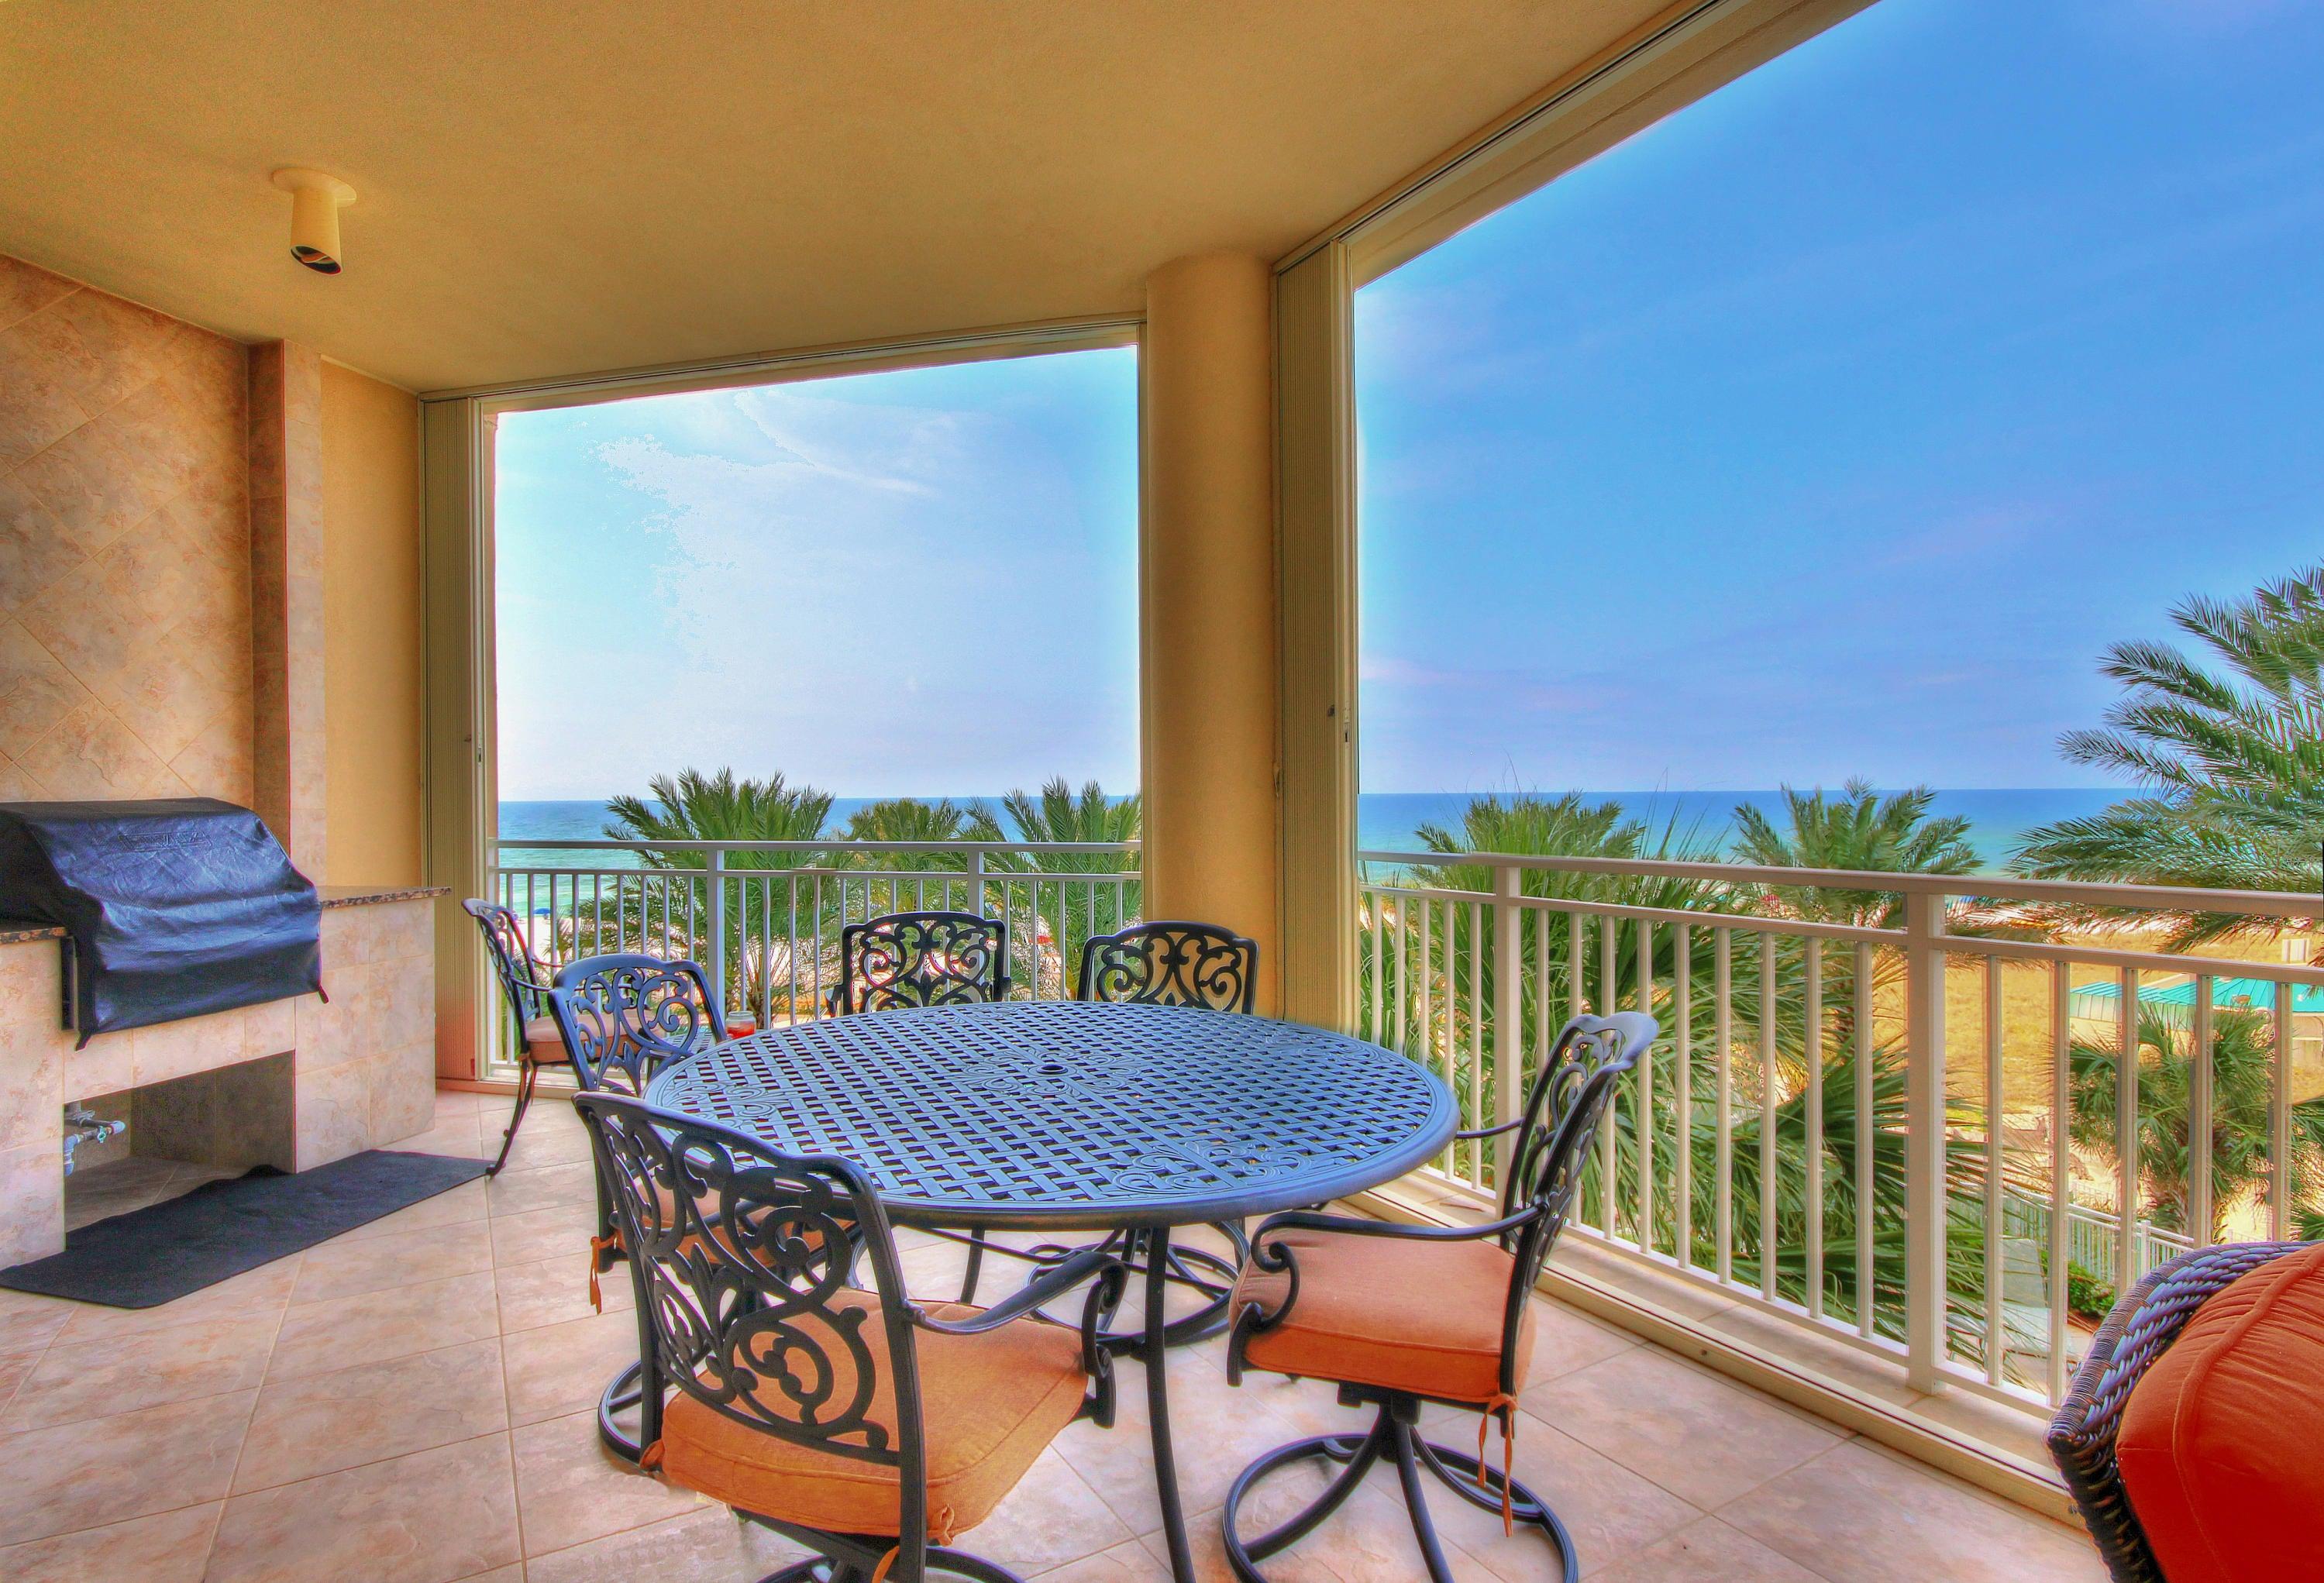 219 Scenic Gulf Drive 230, Miramar Beach, FL 32550